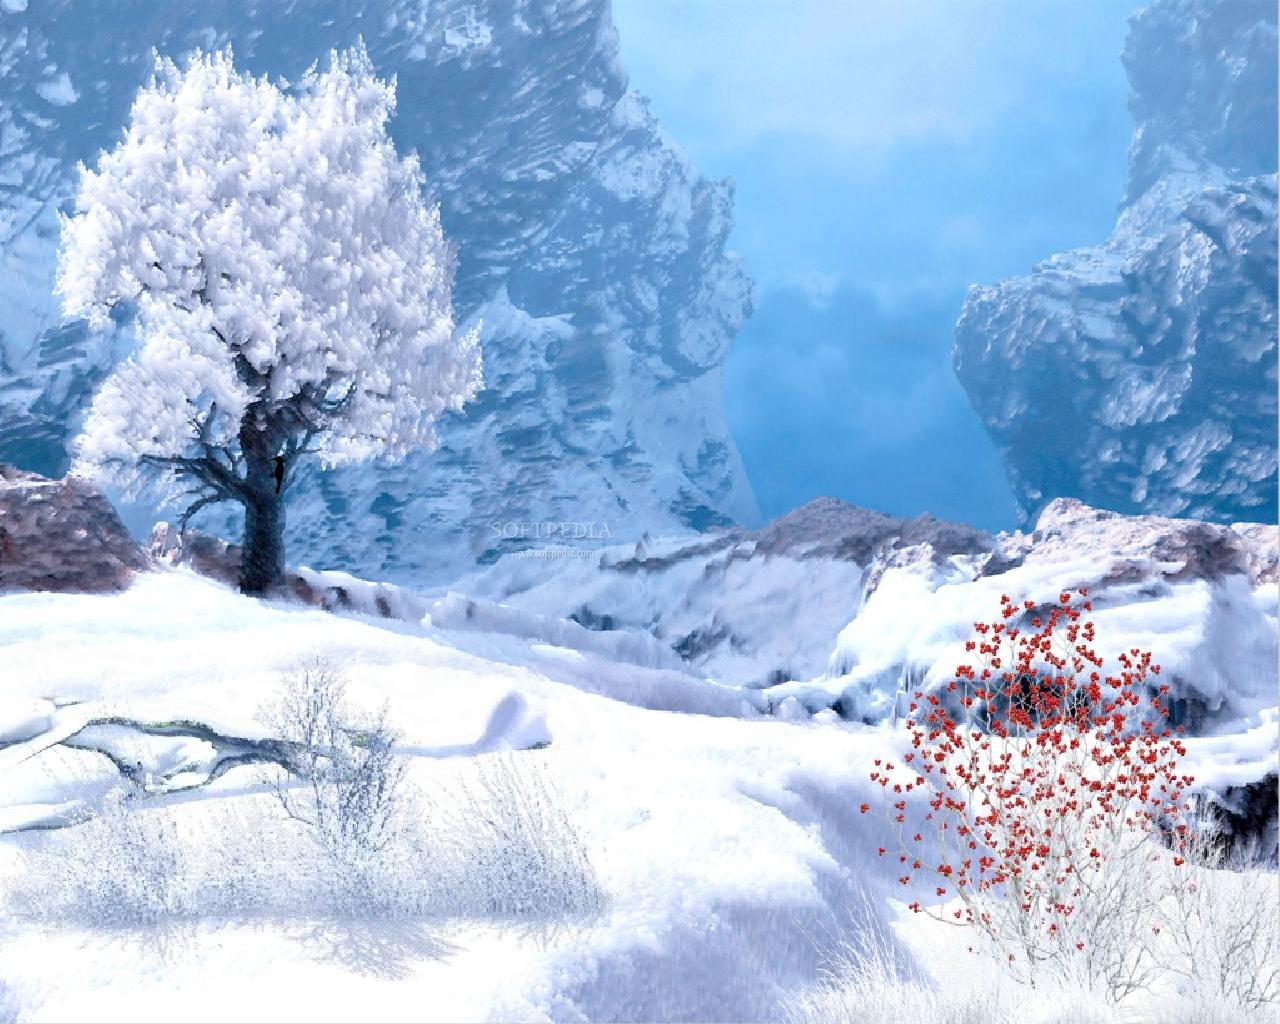 Winter in Mountain   Animated Wallpaper Screenshots 1280x1024